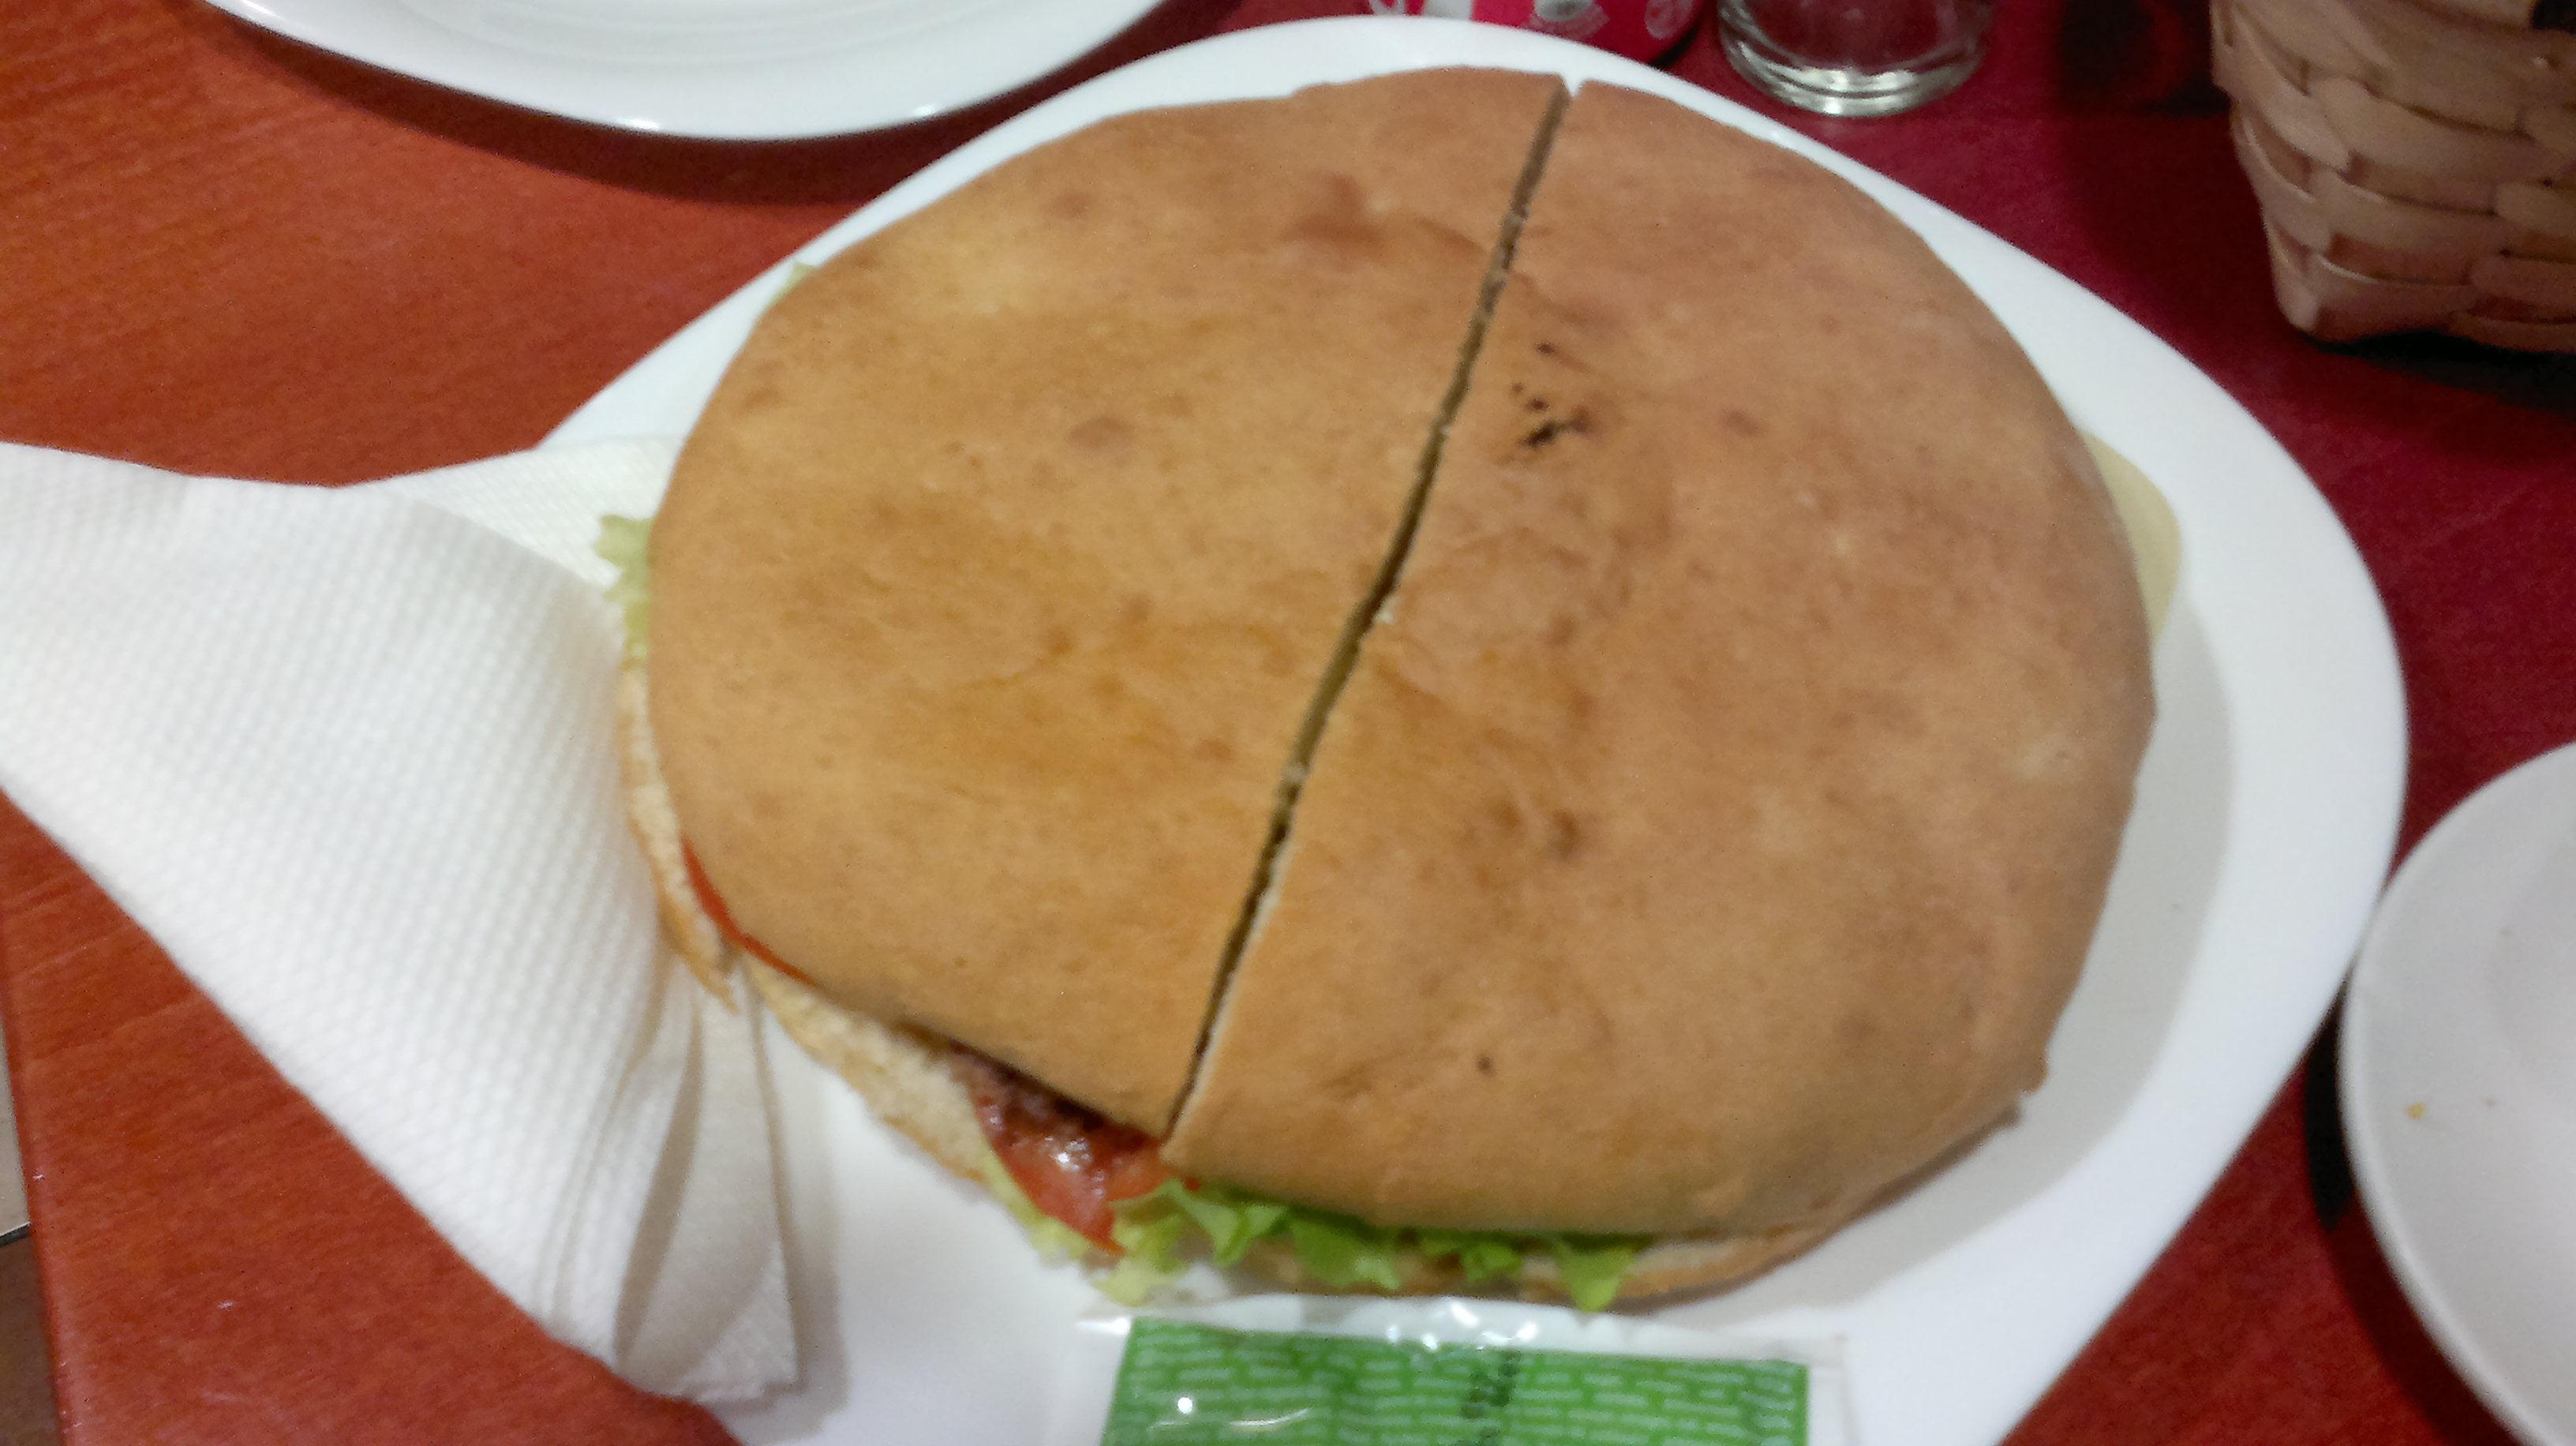 Donde comer una hamburguesa gigante